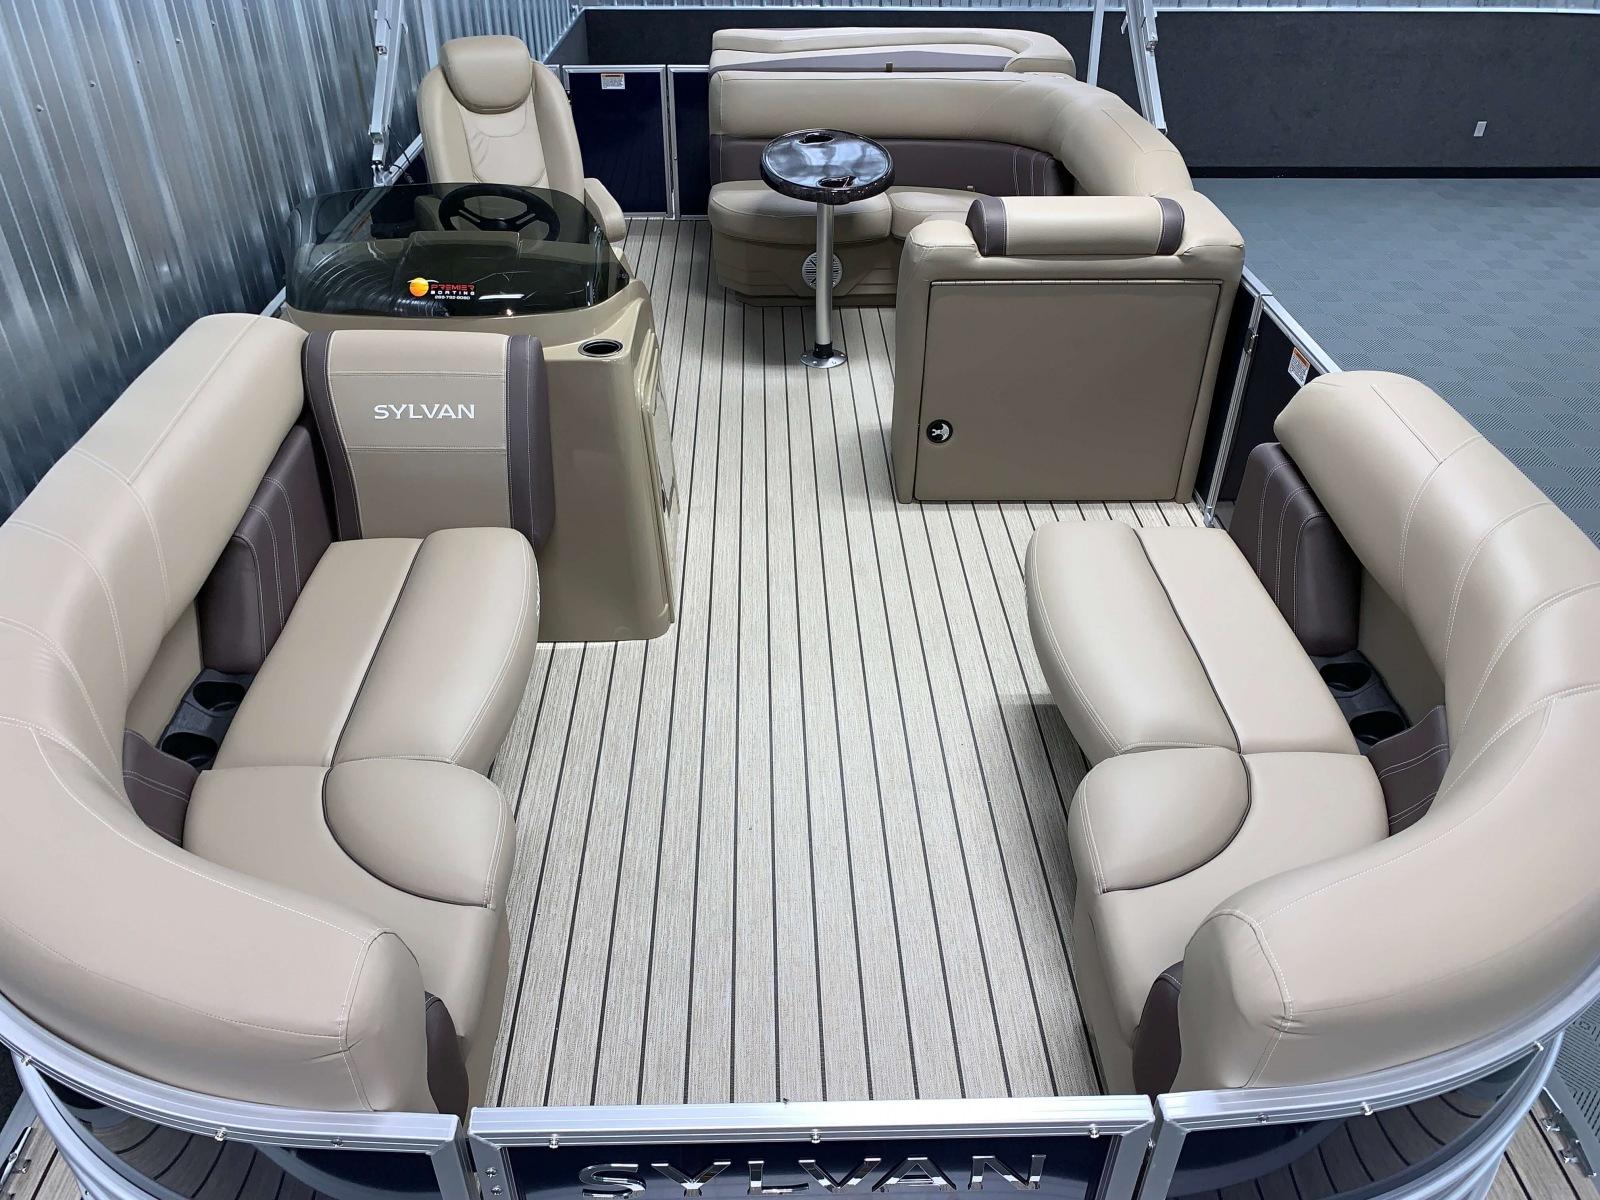 Interior Layout of the 2021 Sylvan Mirage 8520 Cruise Pontoon Boat